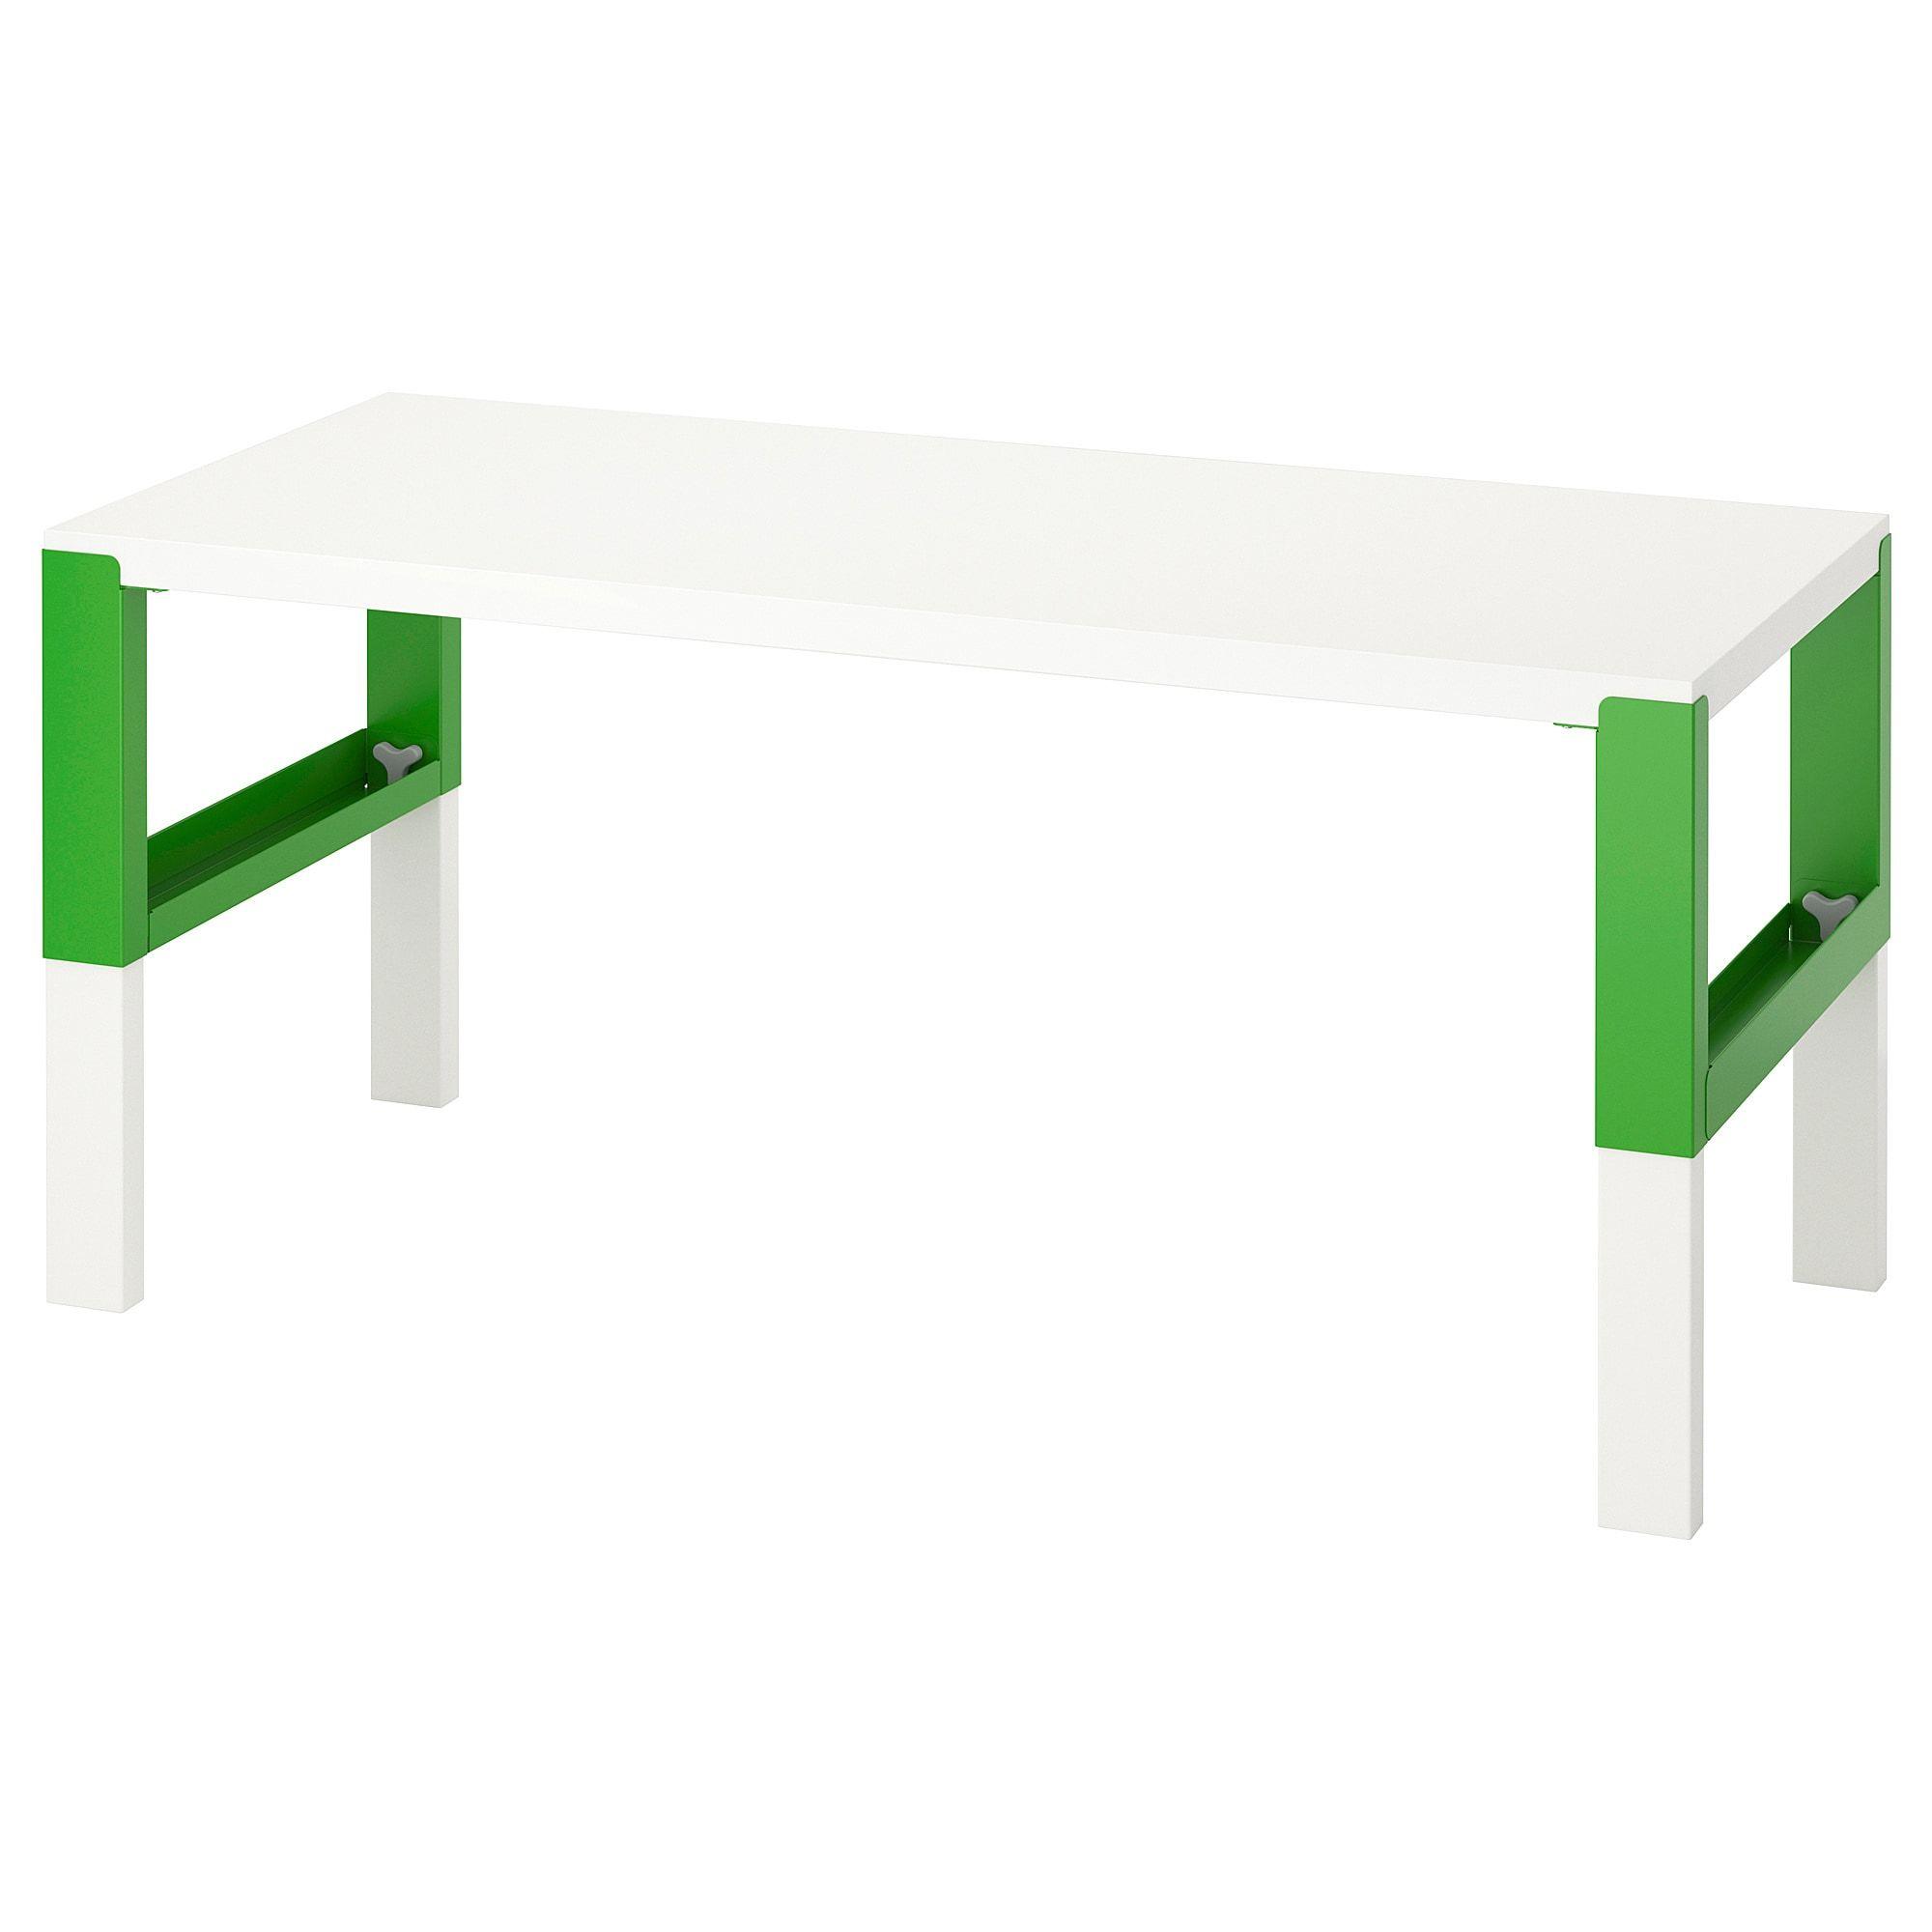 Ikea Pahl White Green Desk In 2020 White Desks Ikea Kid Desk